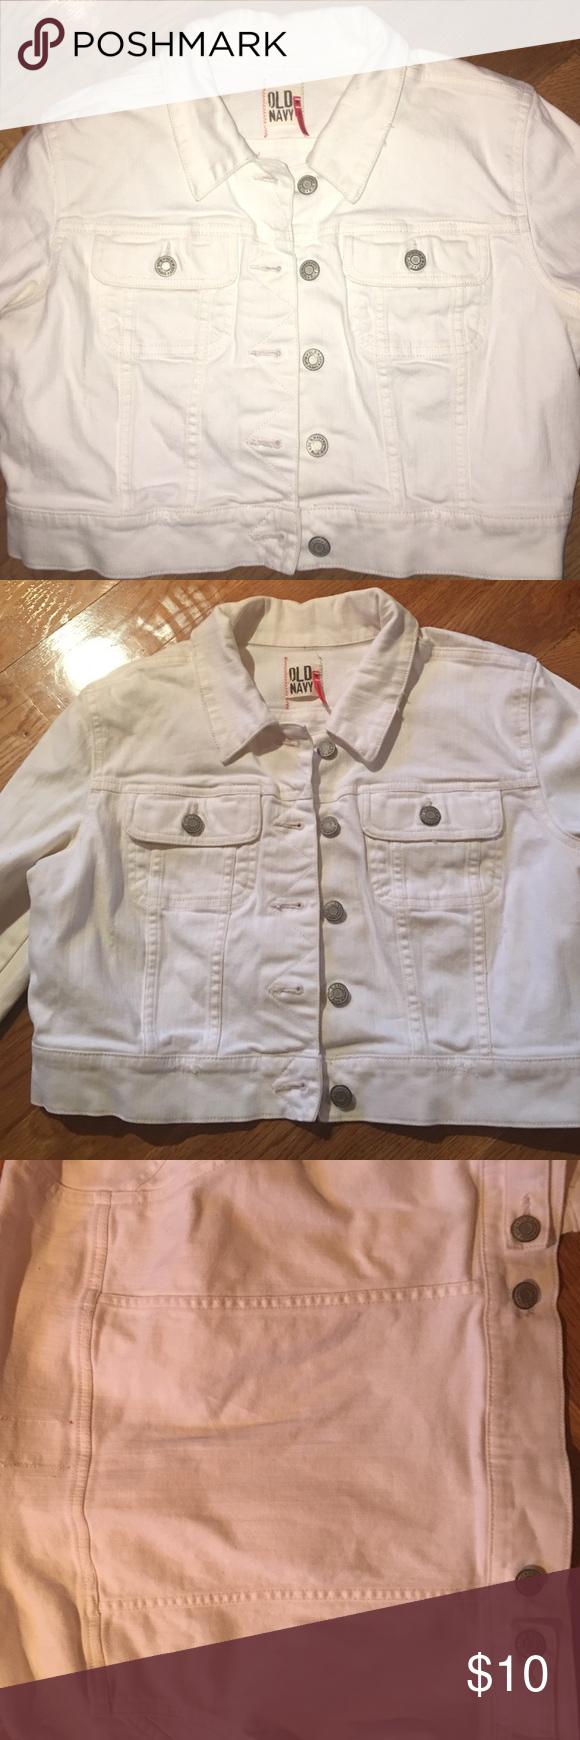 White denim jacket Pretty white denim jacket. I've maybe worn it twice. No stains Old Navy Jackets & Coats Jean Jackets